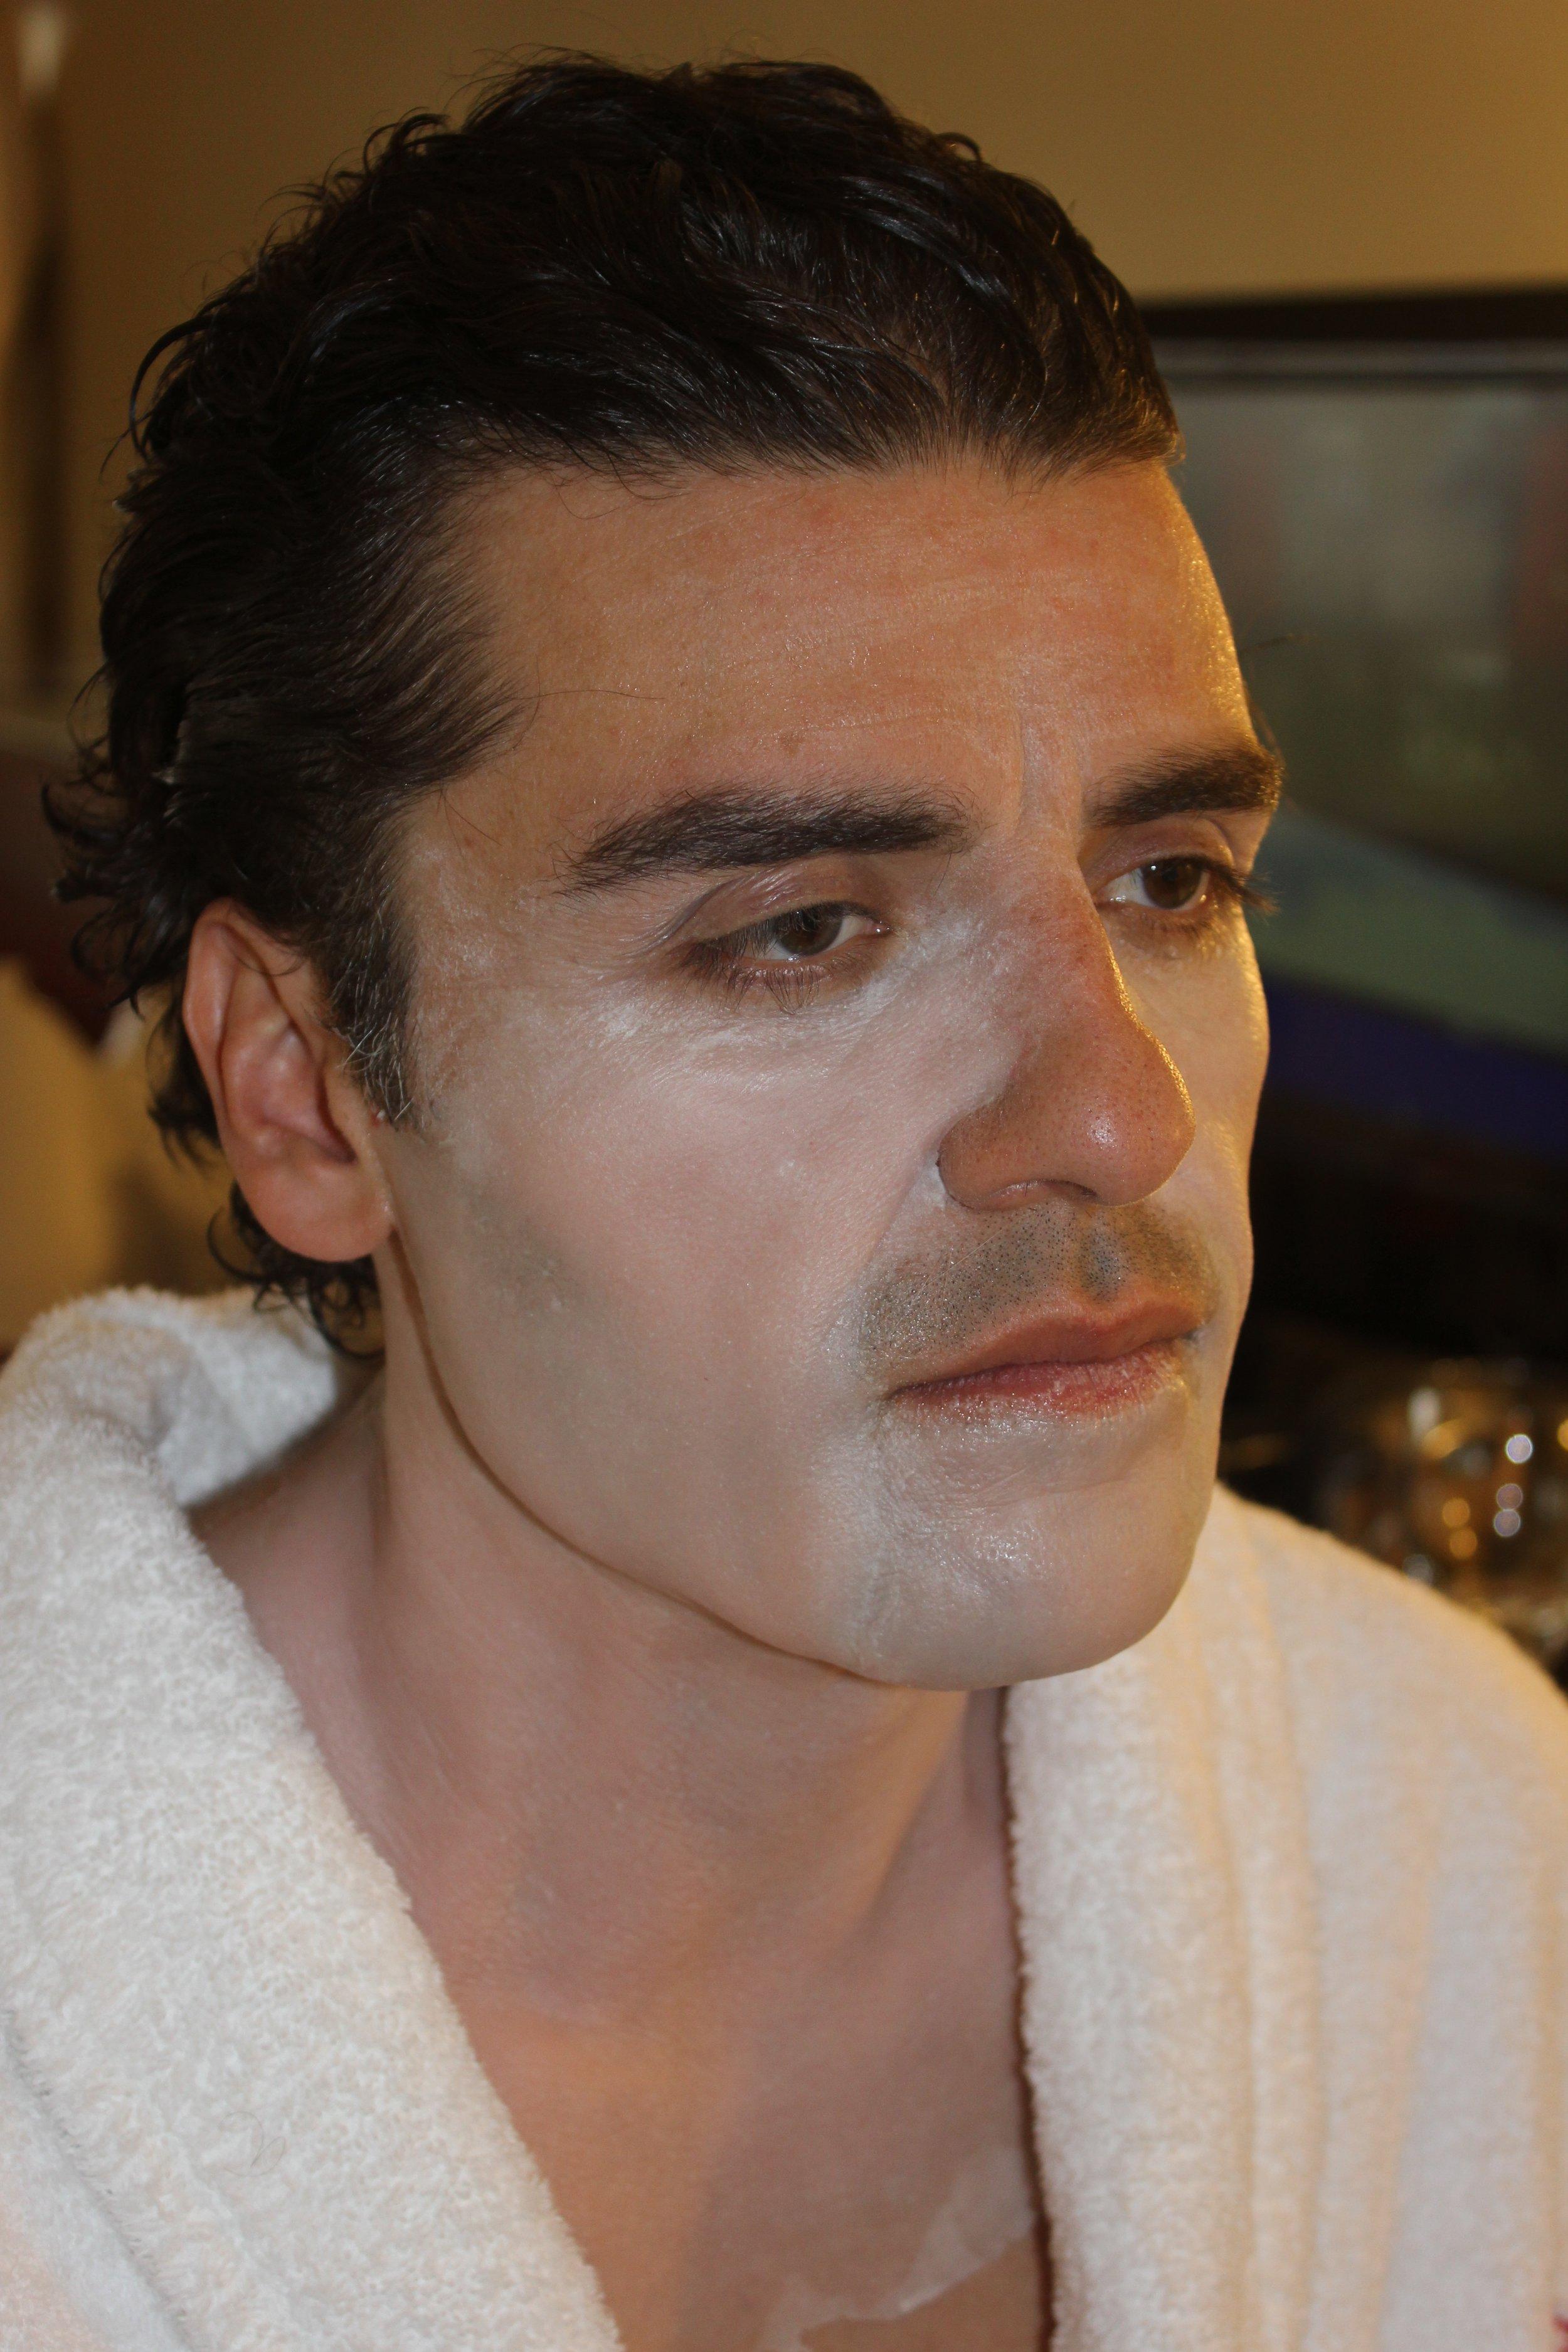 Oscar Makeup in Mid Process 04.jpg